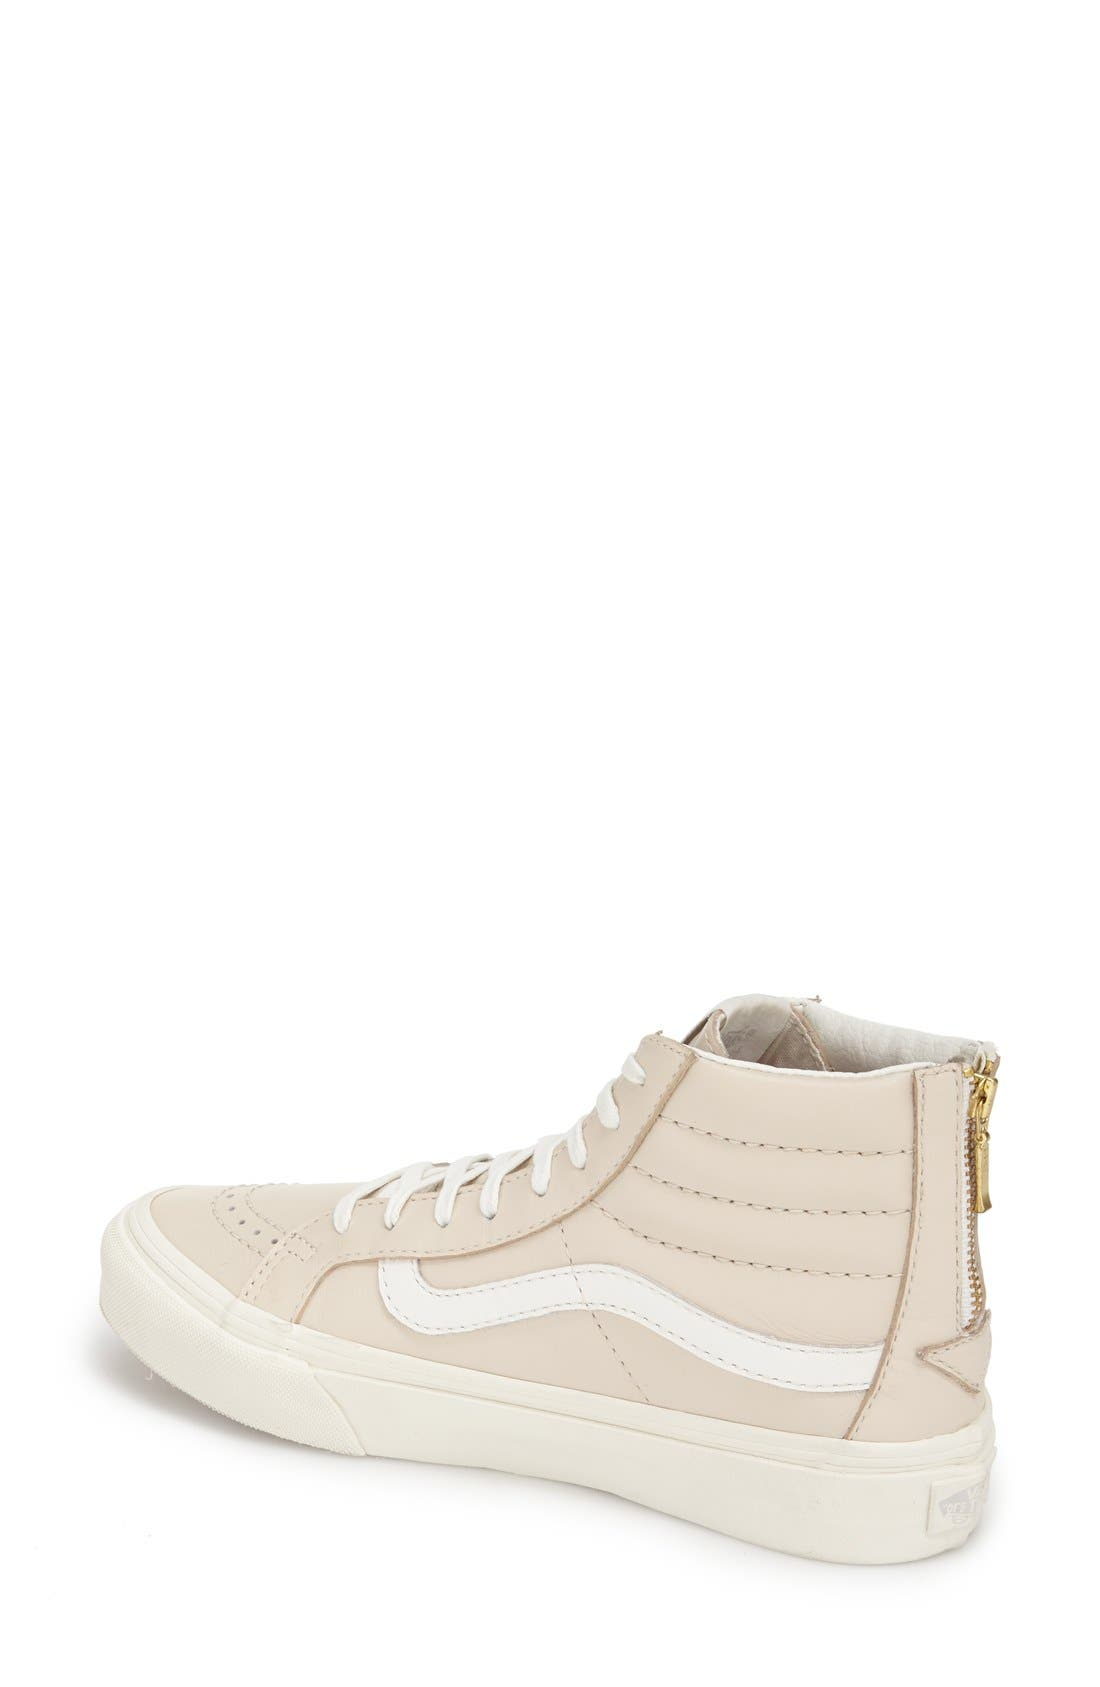 Alternate Image 2  - Vans 'Sk8-Hi Slim' High Top Sneaker (Women)